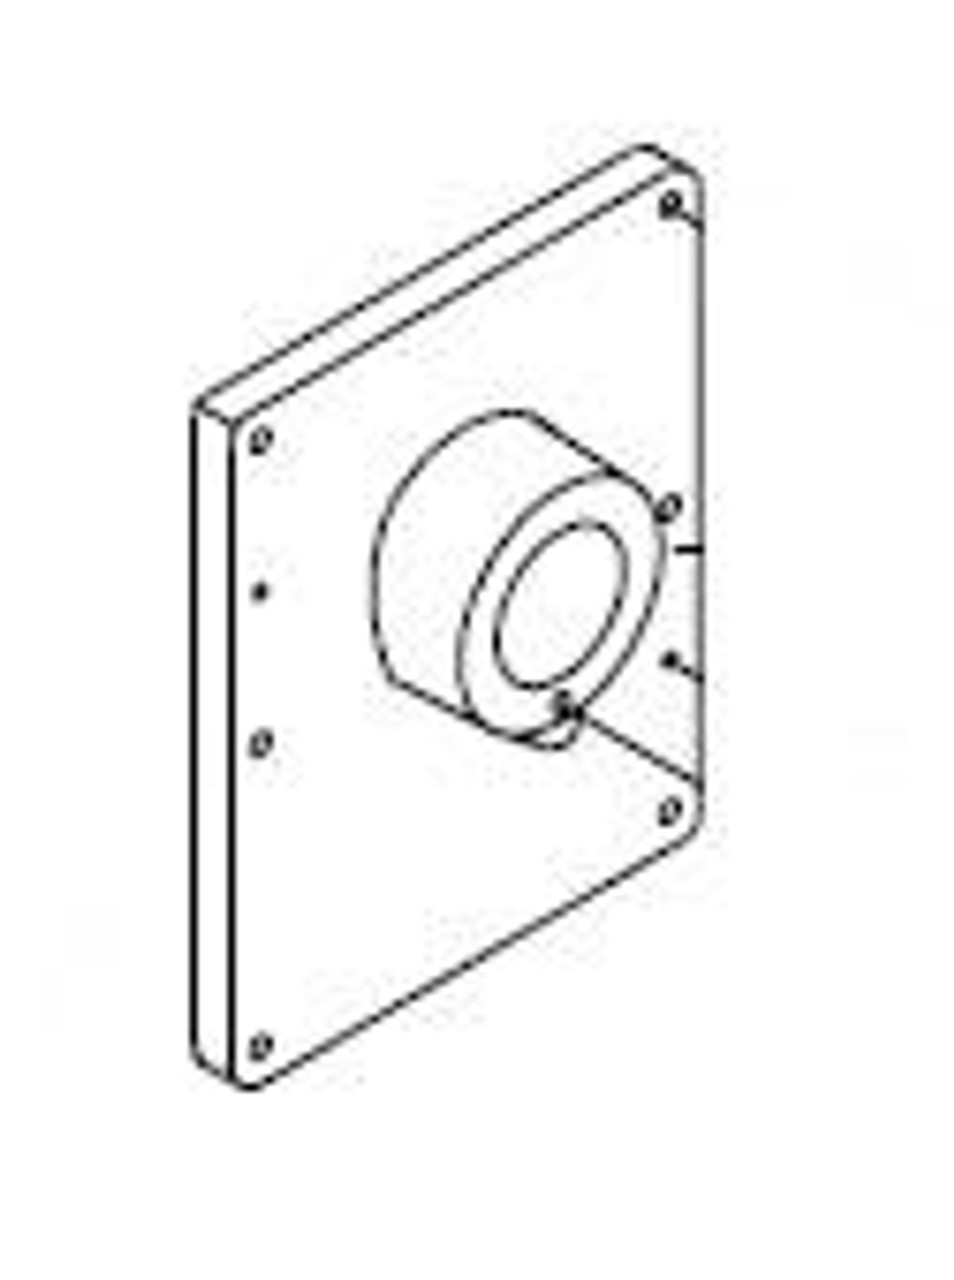 TorRey Gear Cover Kit -- M12FS Series - 05-73233